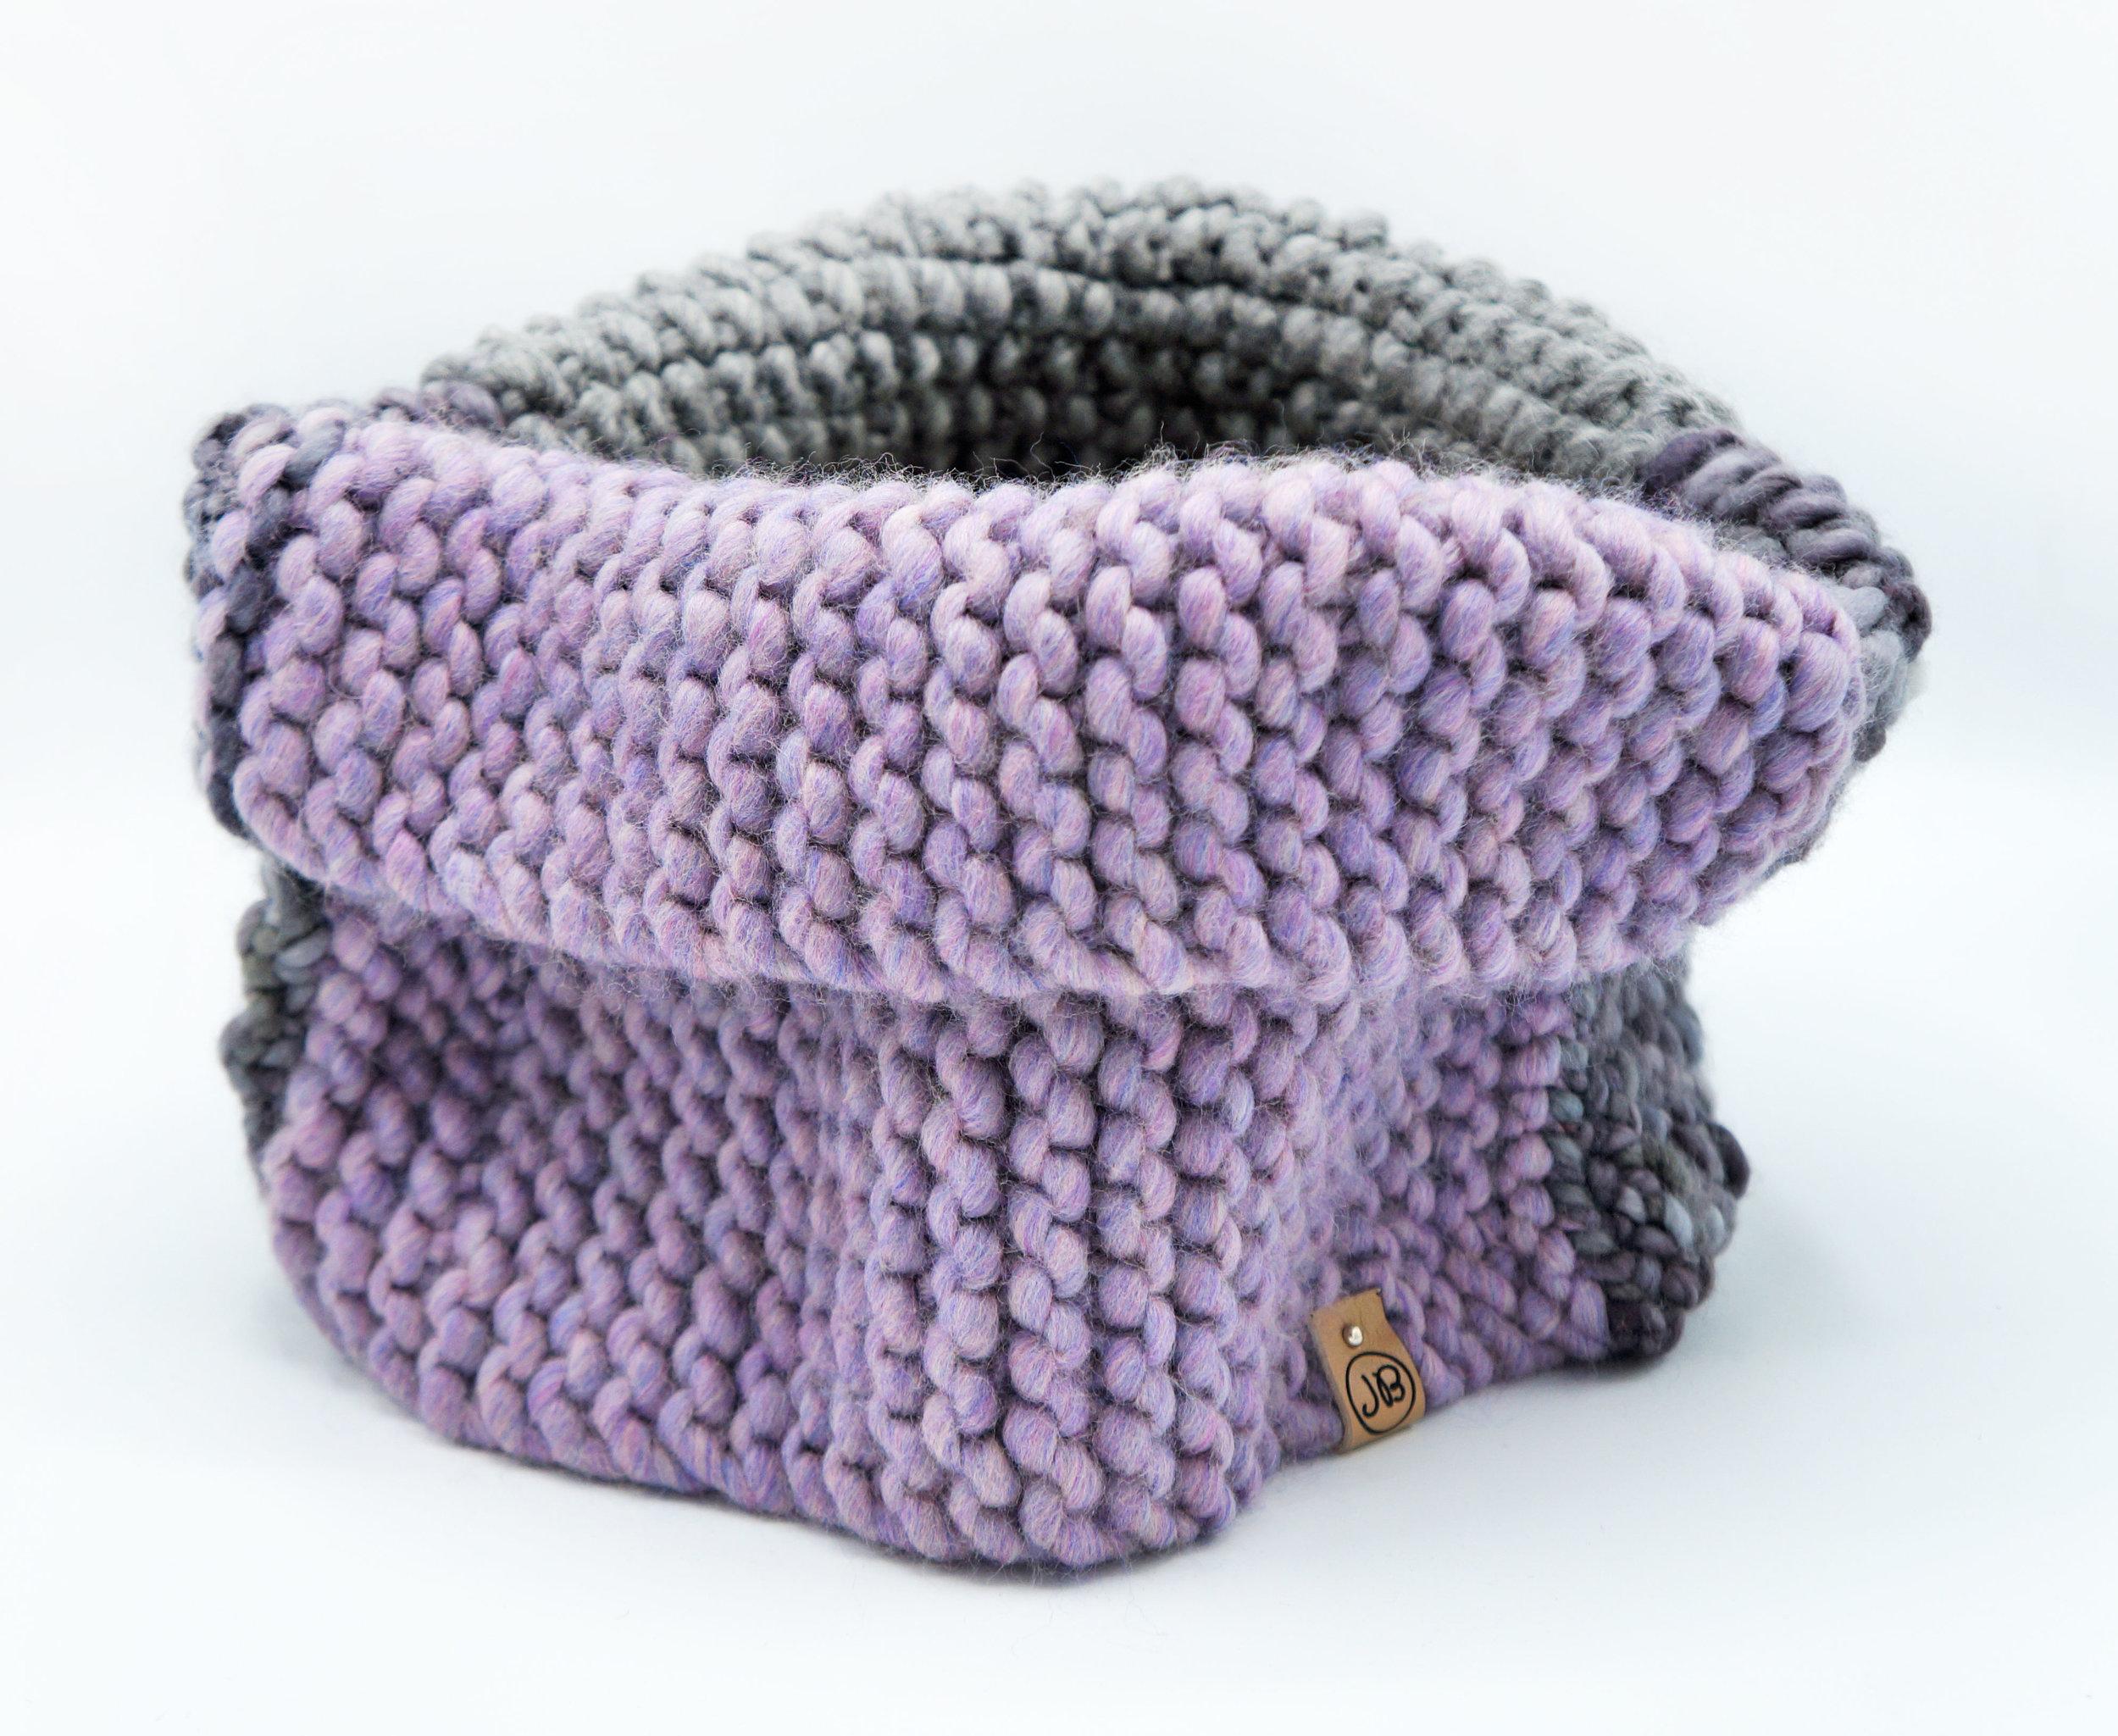 Cowl Neck   Lavender & Gray $135.00